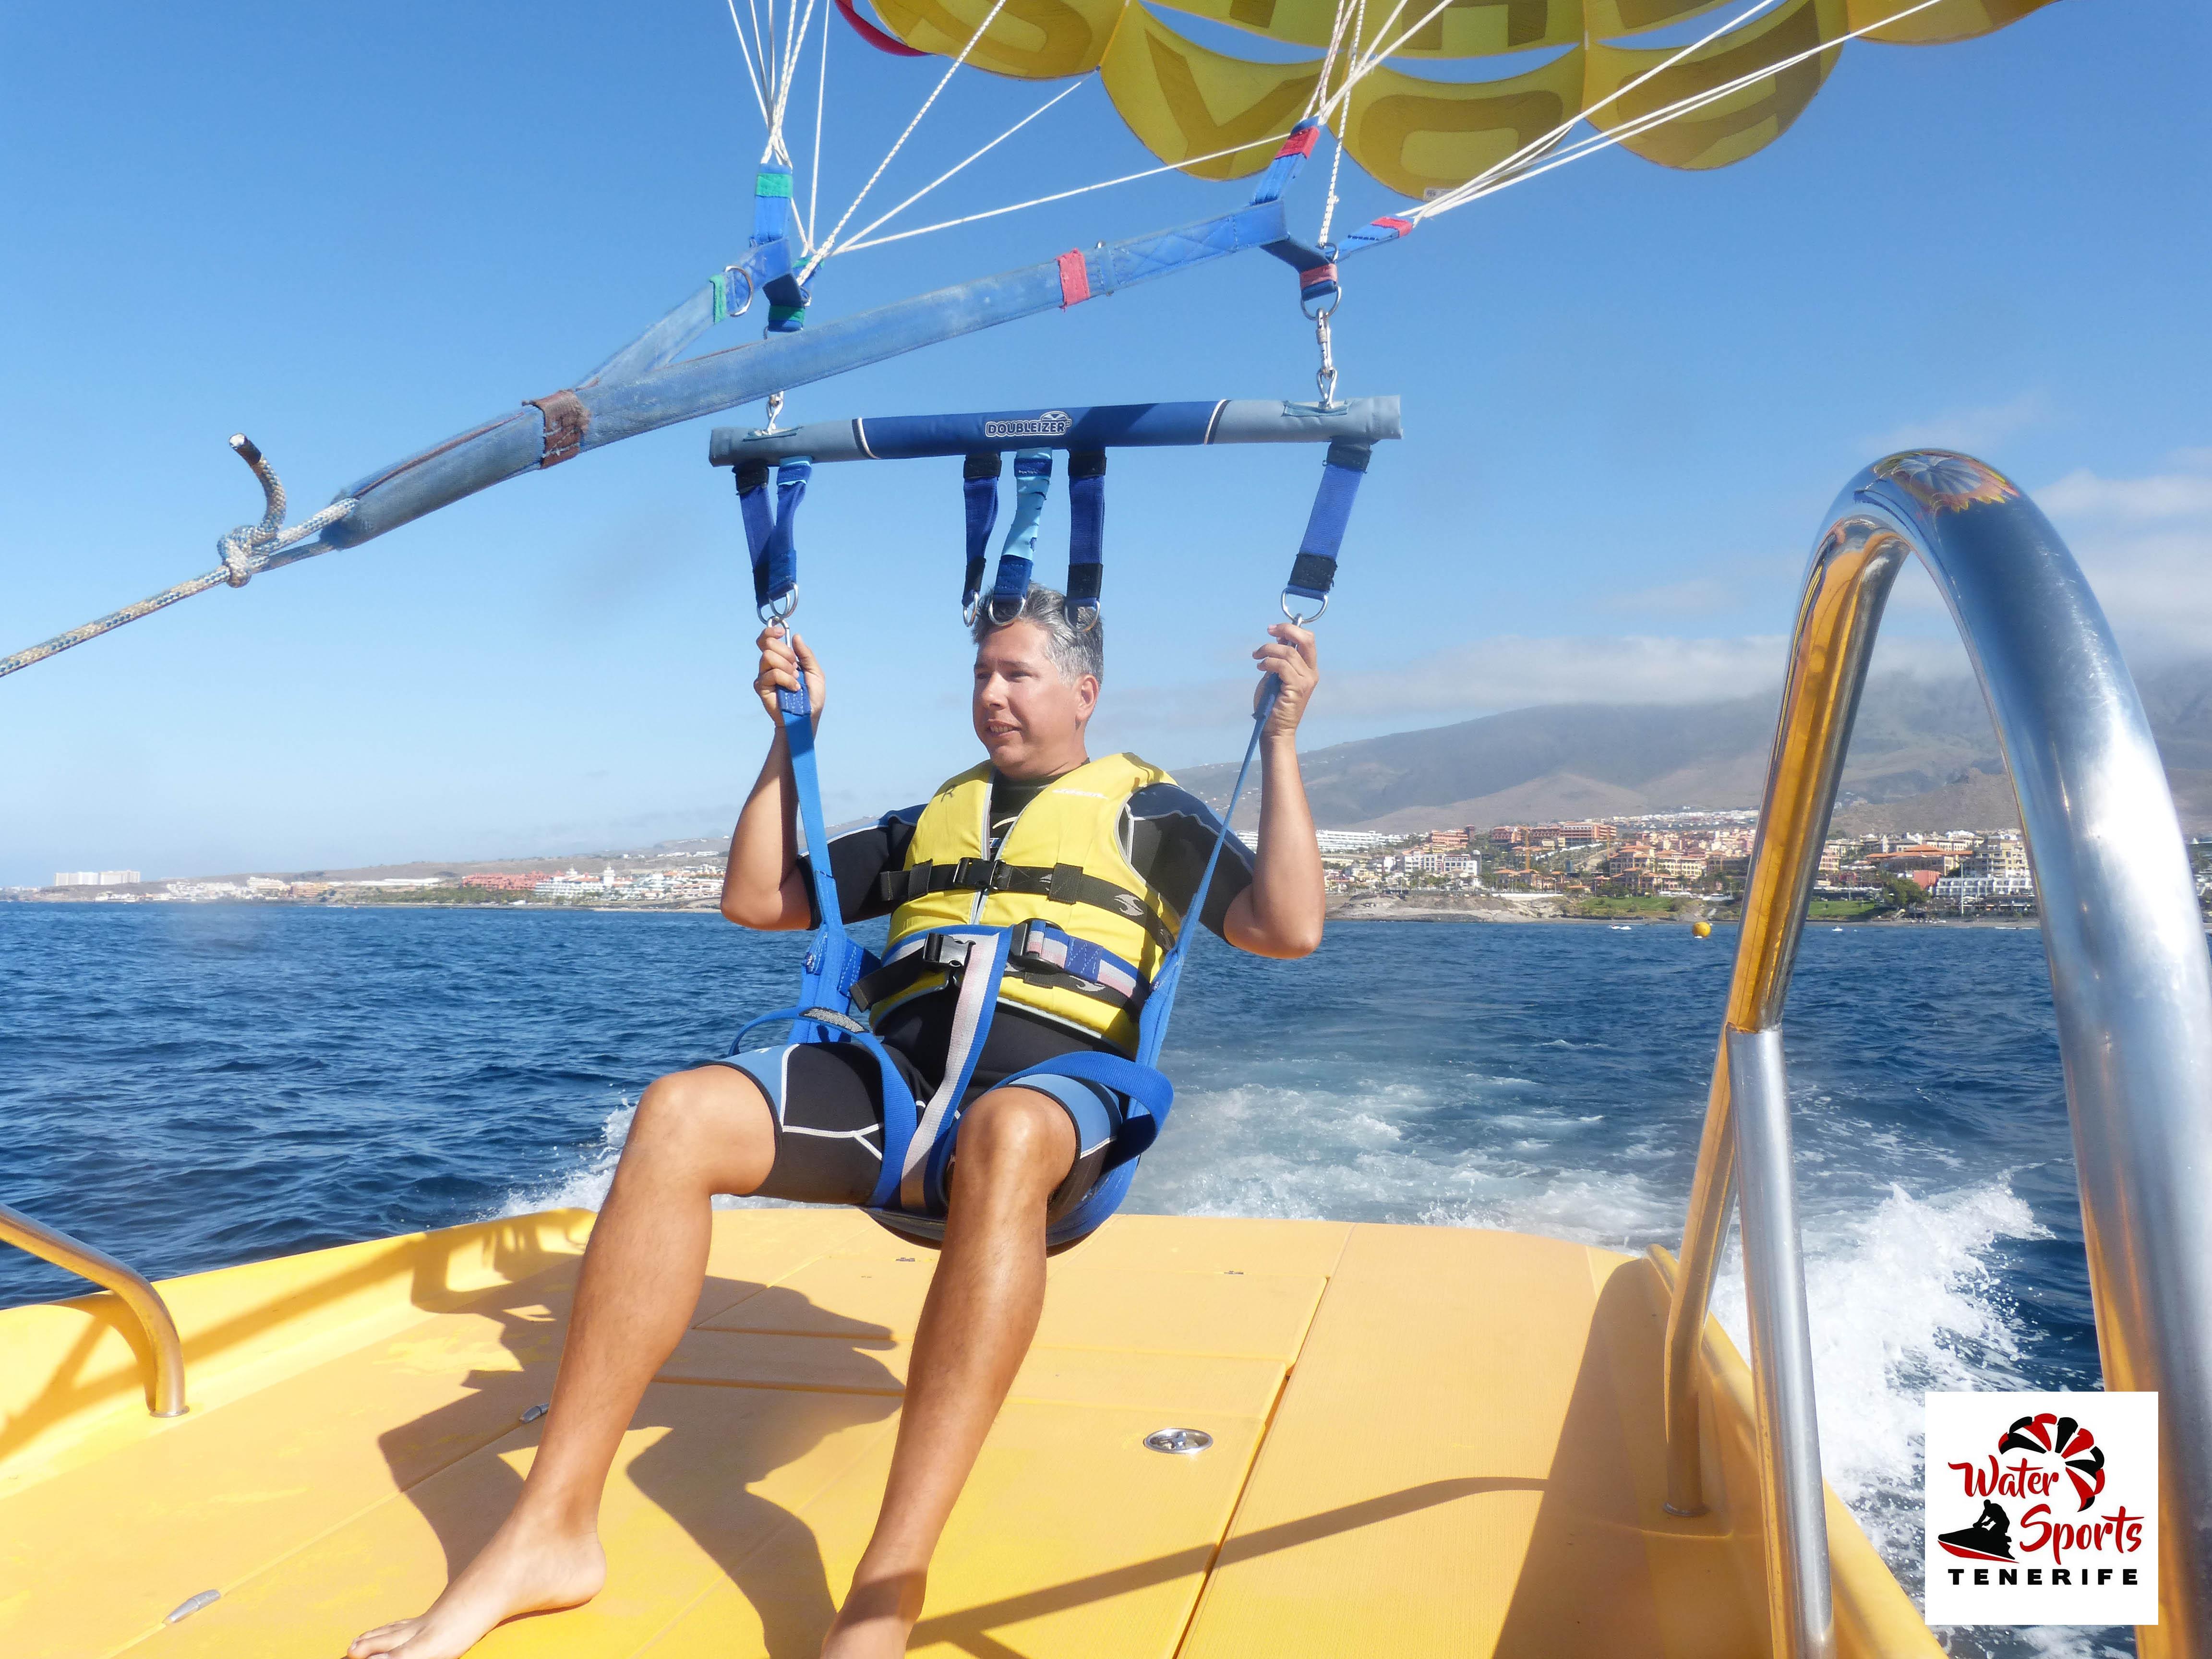 paracaidismo watersport tenerife sur